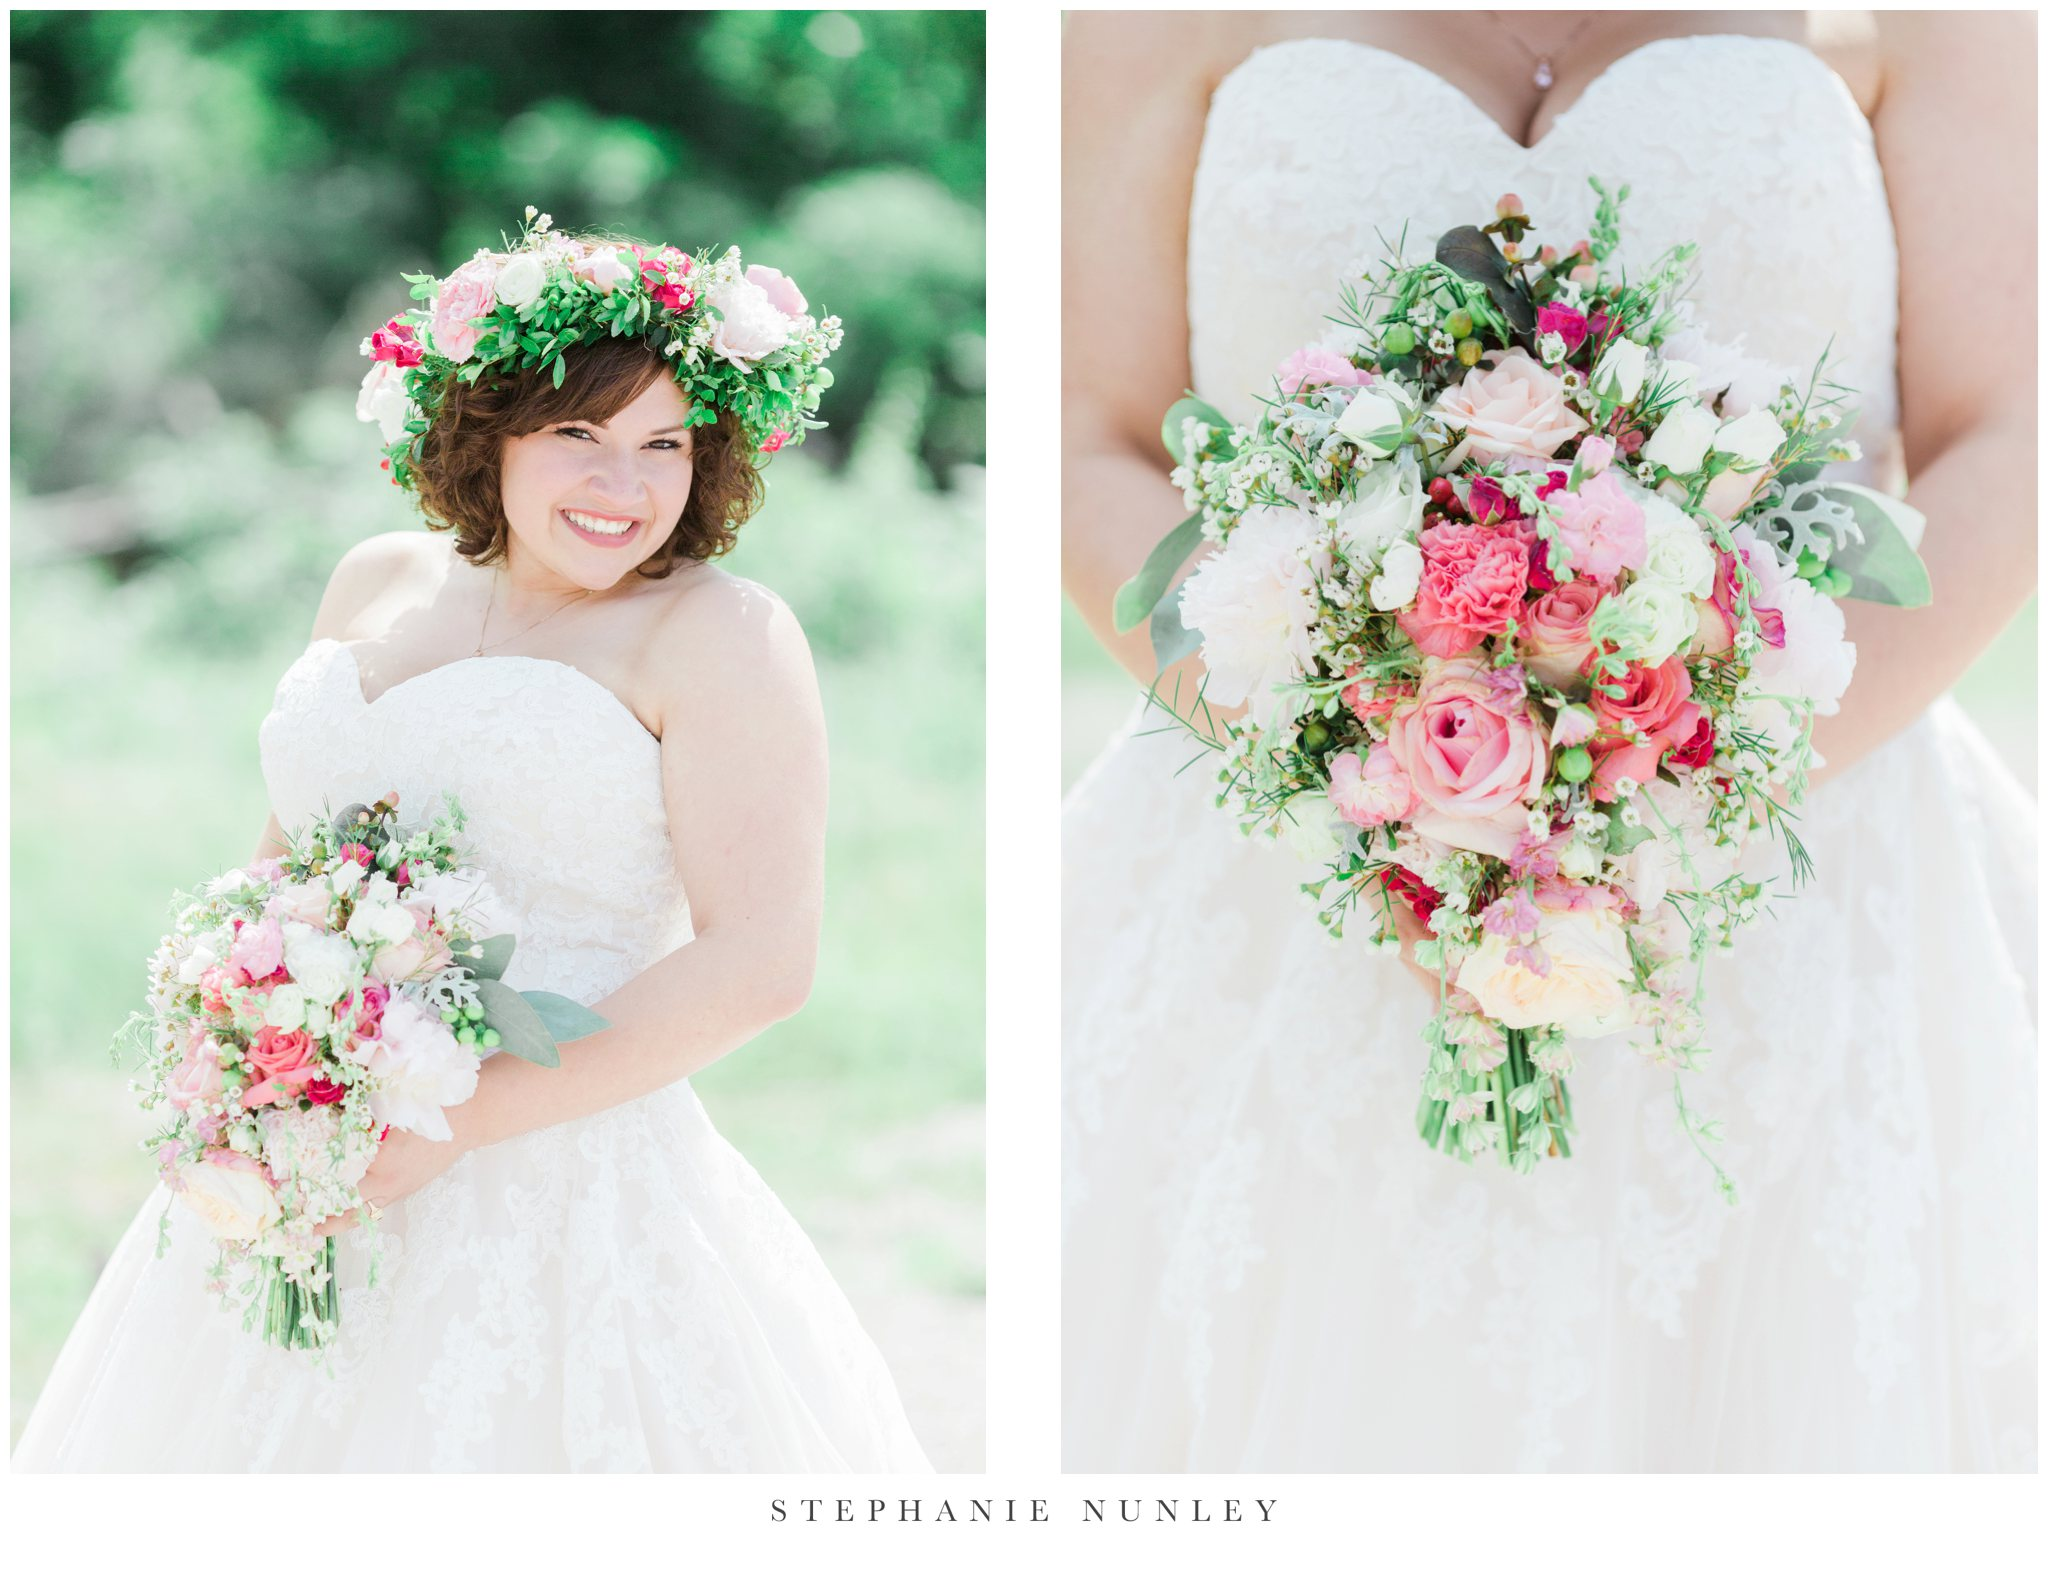 romantic-outdoor-wedding-with-flower-crown-0047.jpg